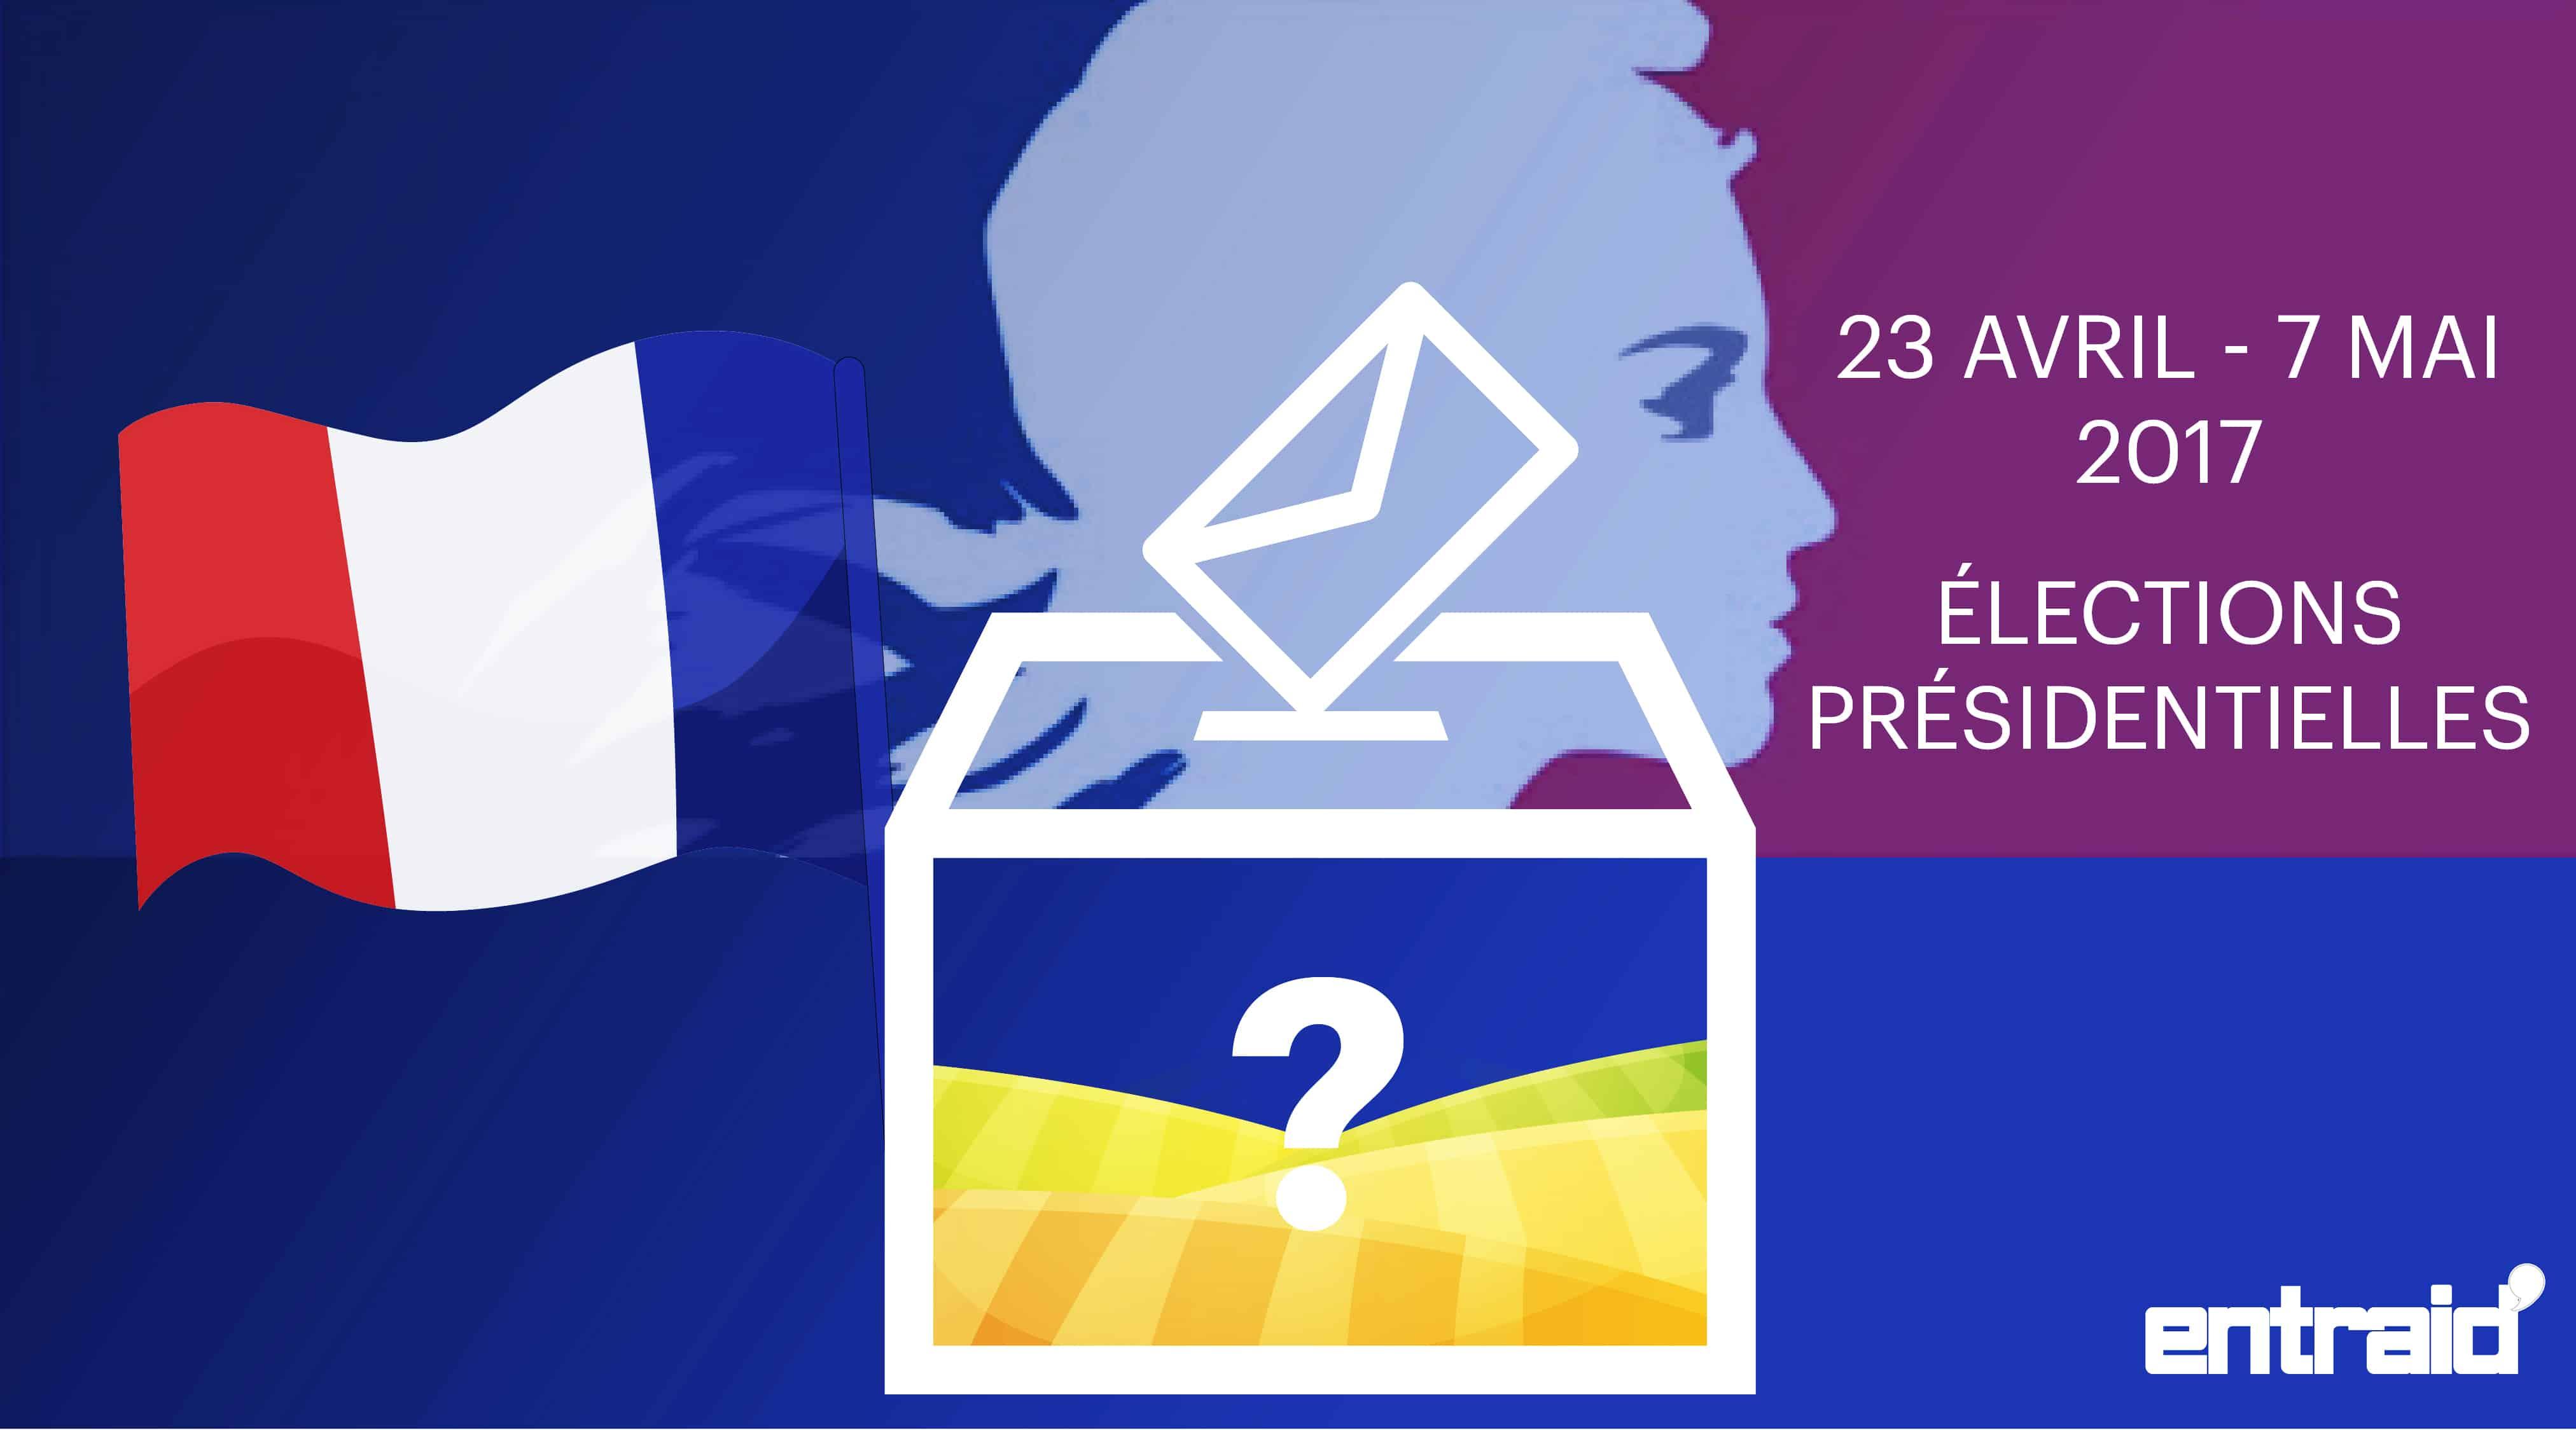 elections presidentielles